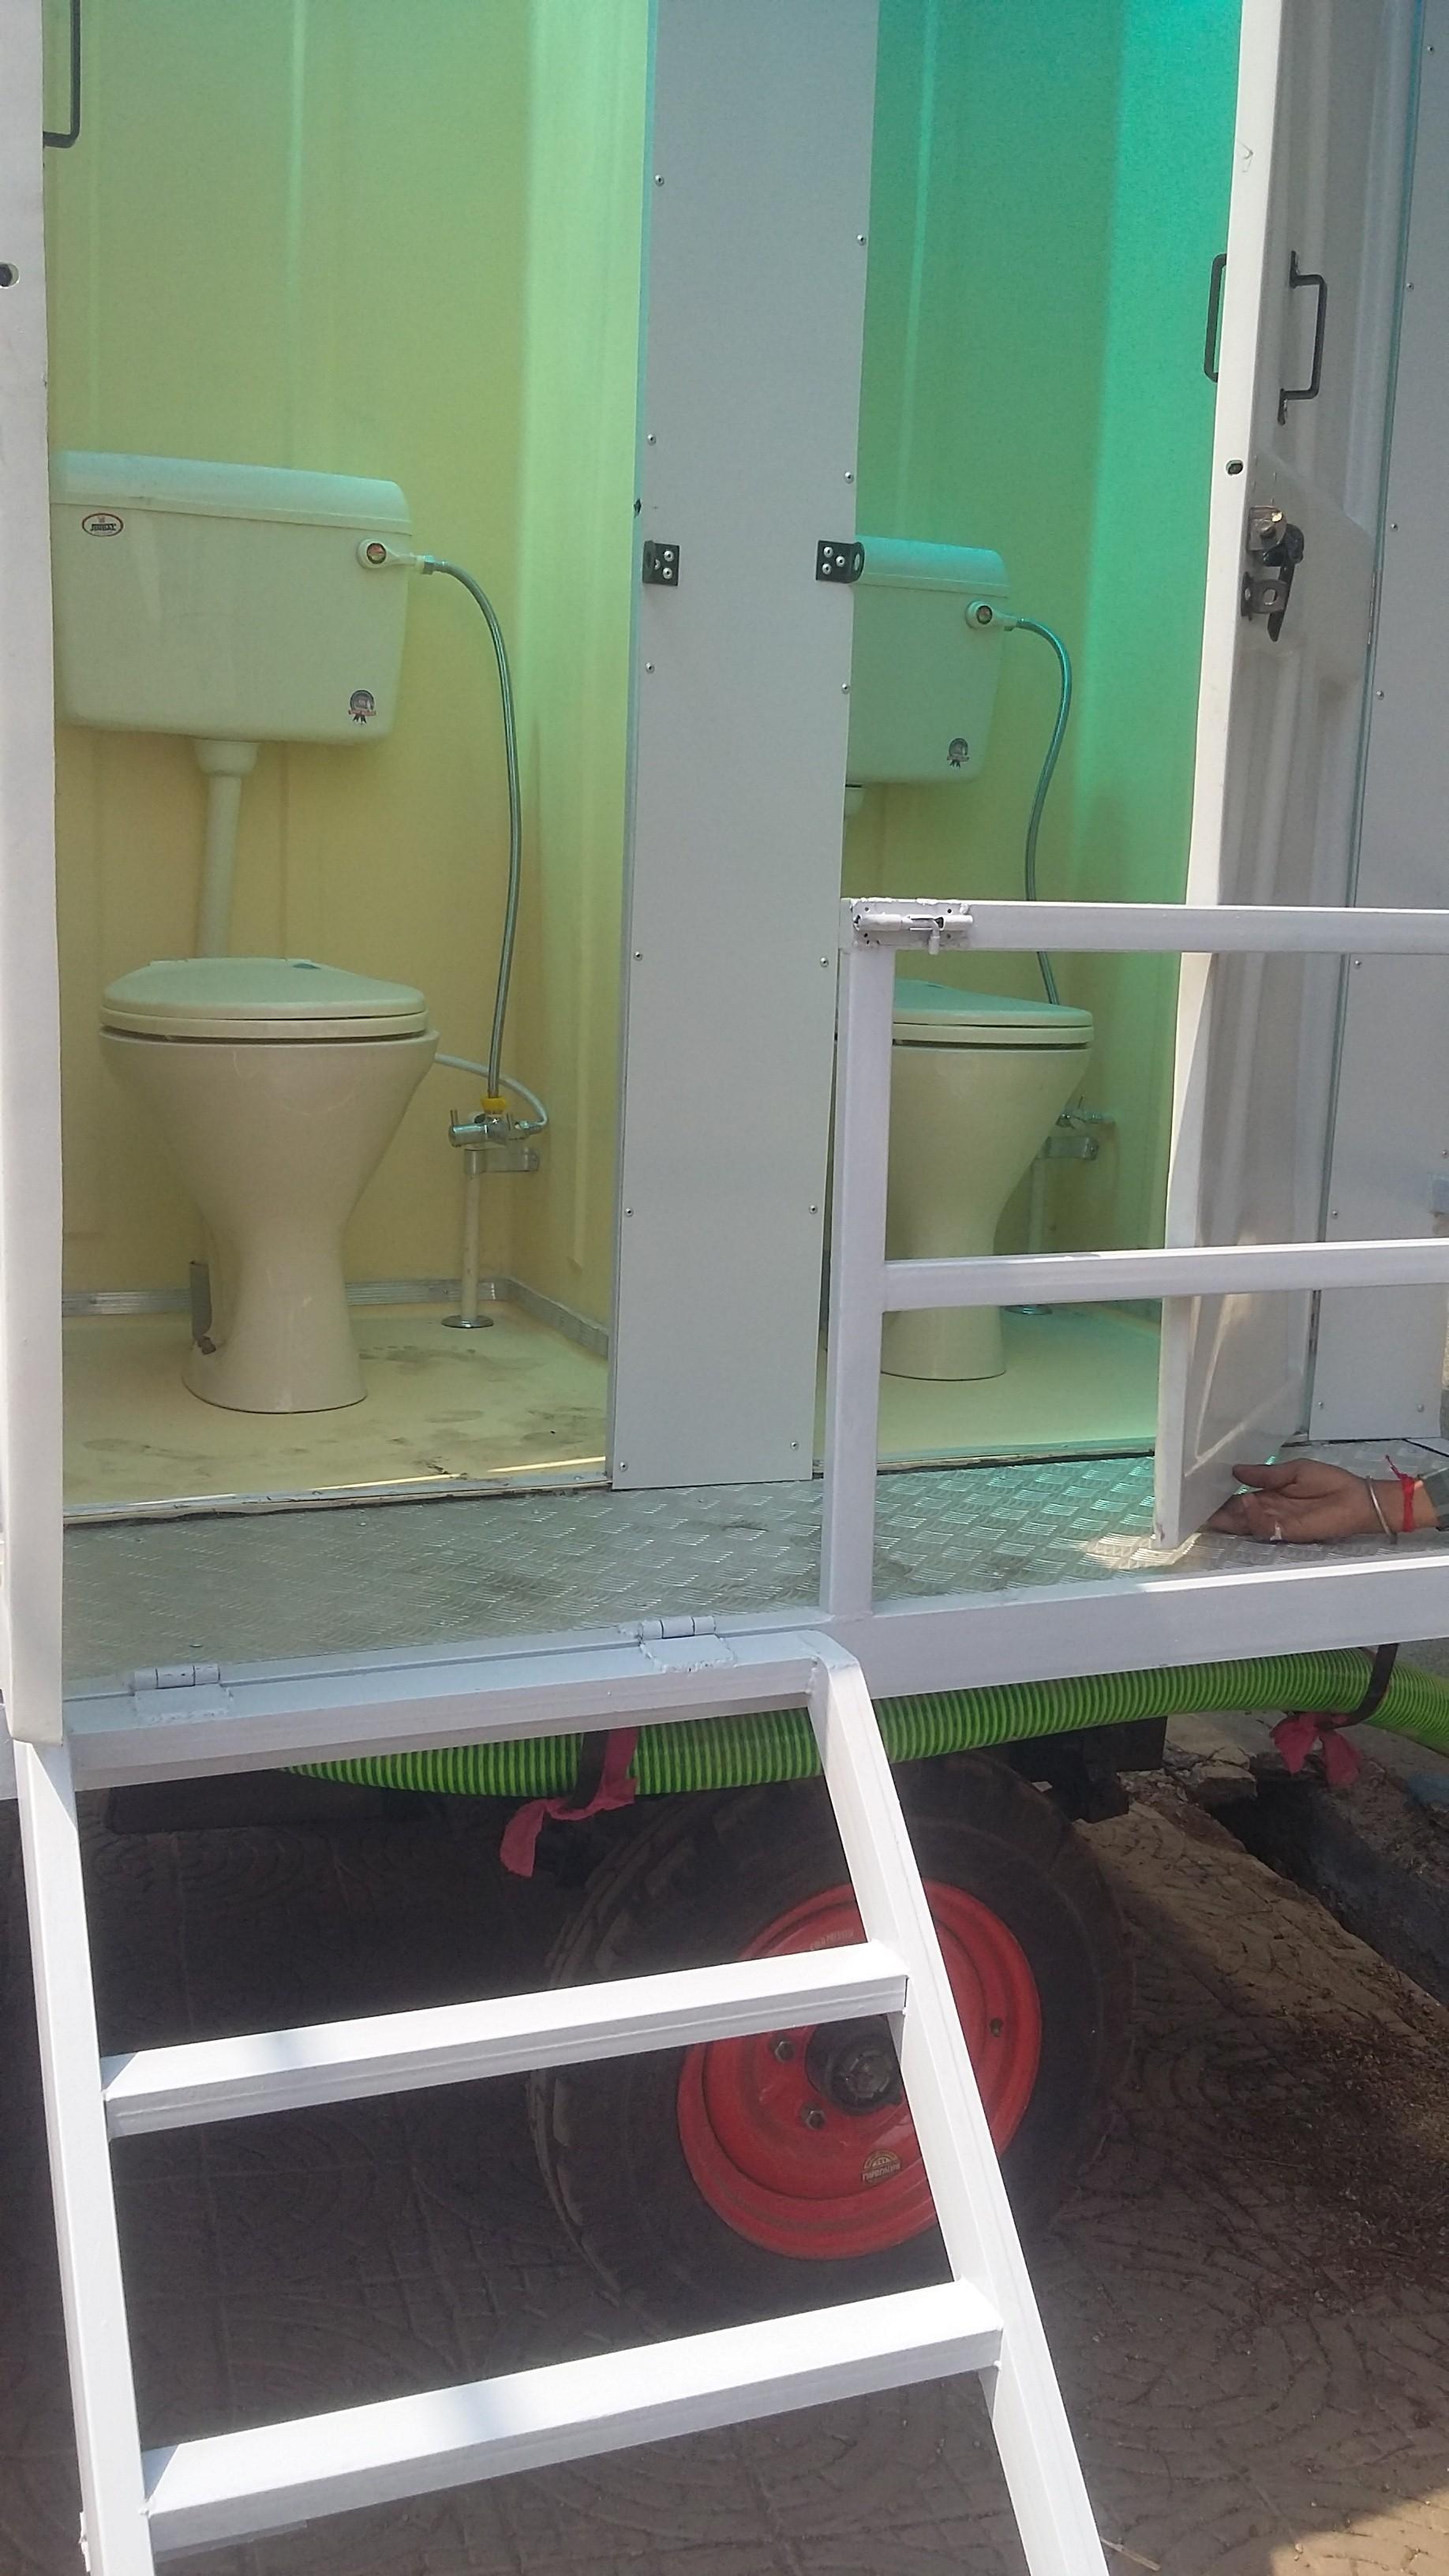 Bio mobile toilet van 4 seater